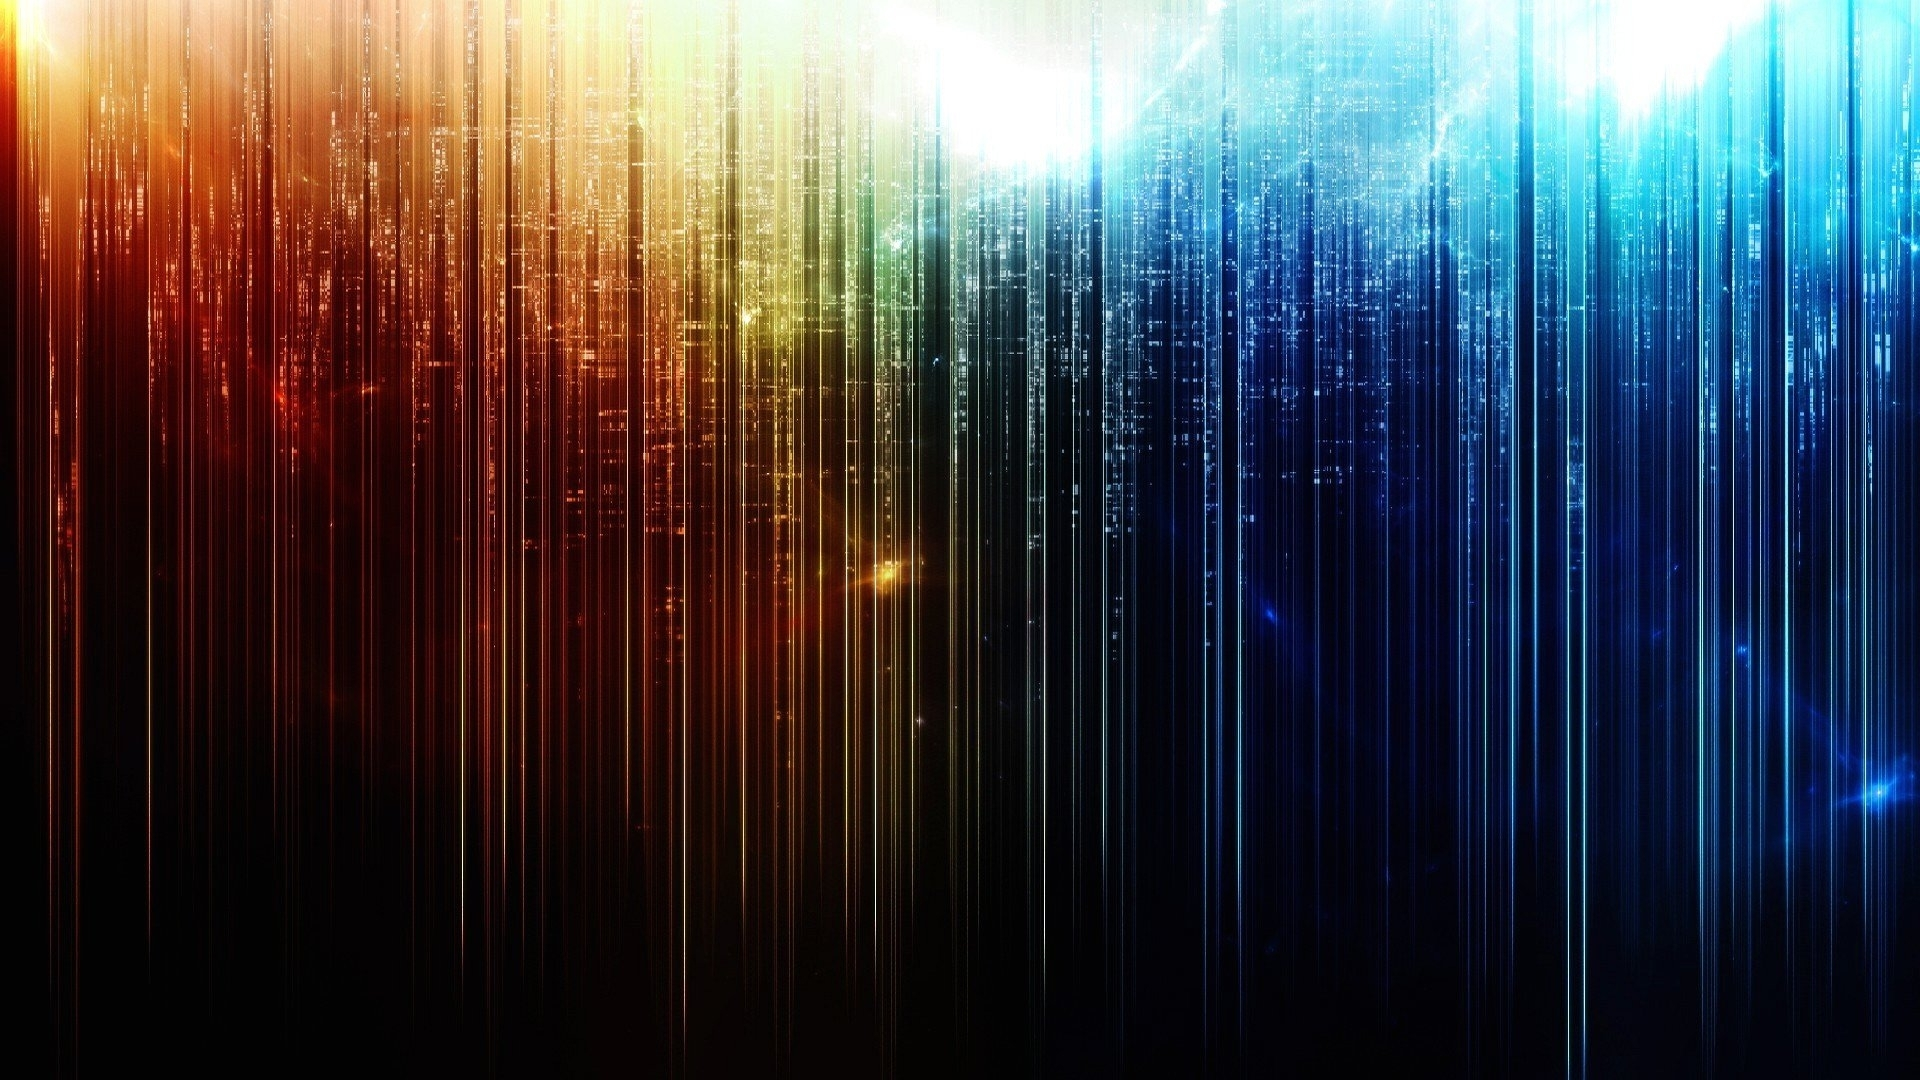 wallpaper light raining abstract 1920 x 1080 full hd - 1920 x 1080